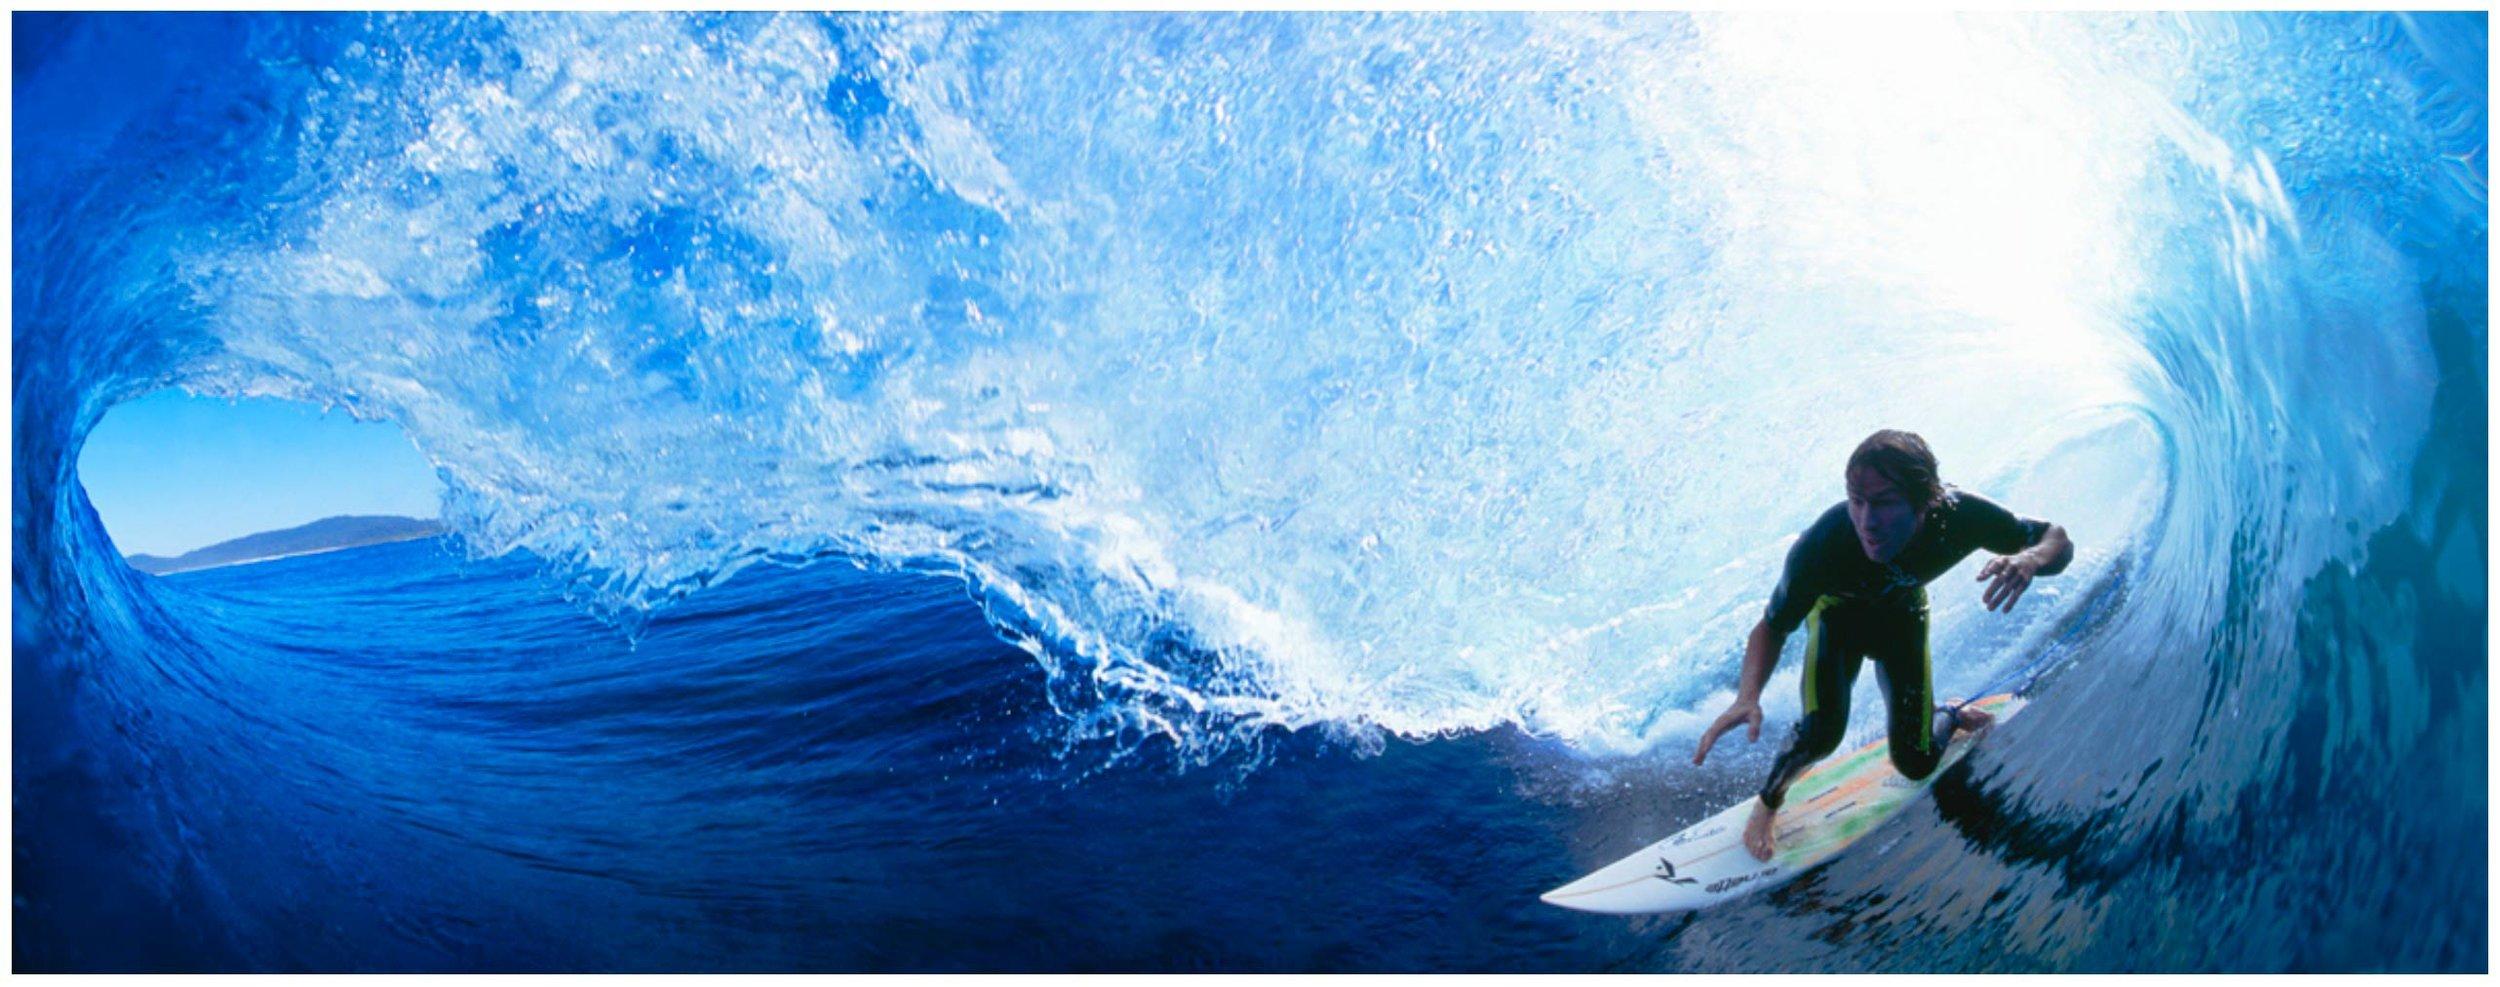 rodd-owen-surf-photography-for-sale-owenphoto-262.jpg